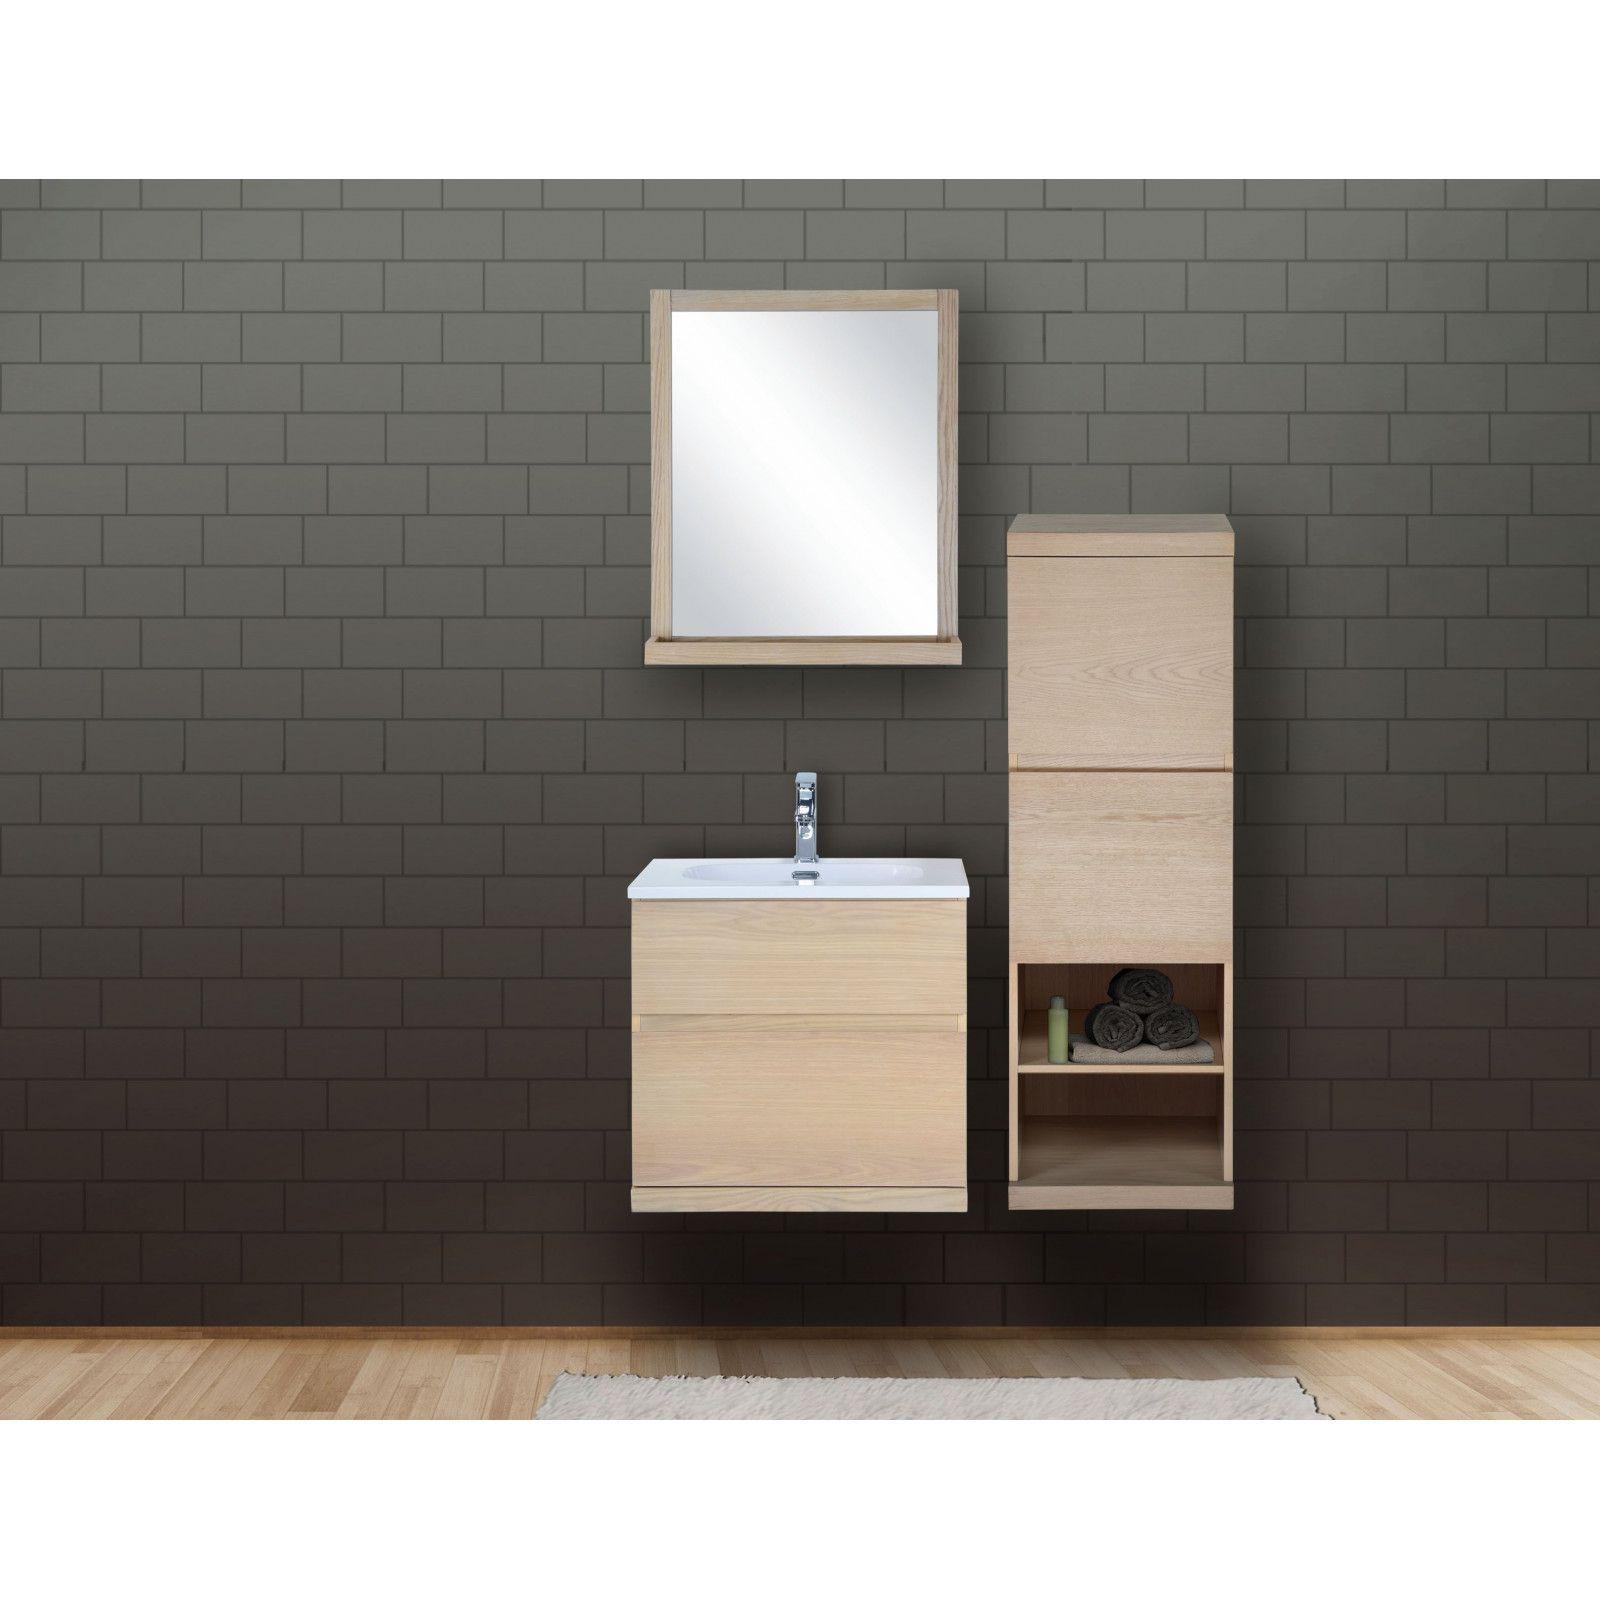 Ensemble salle de bain chêne 60 cm meuble + vasque + miroir + demi-colonne ENIO